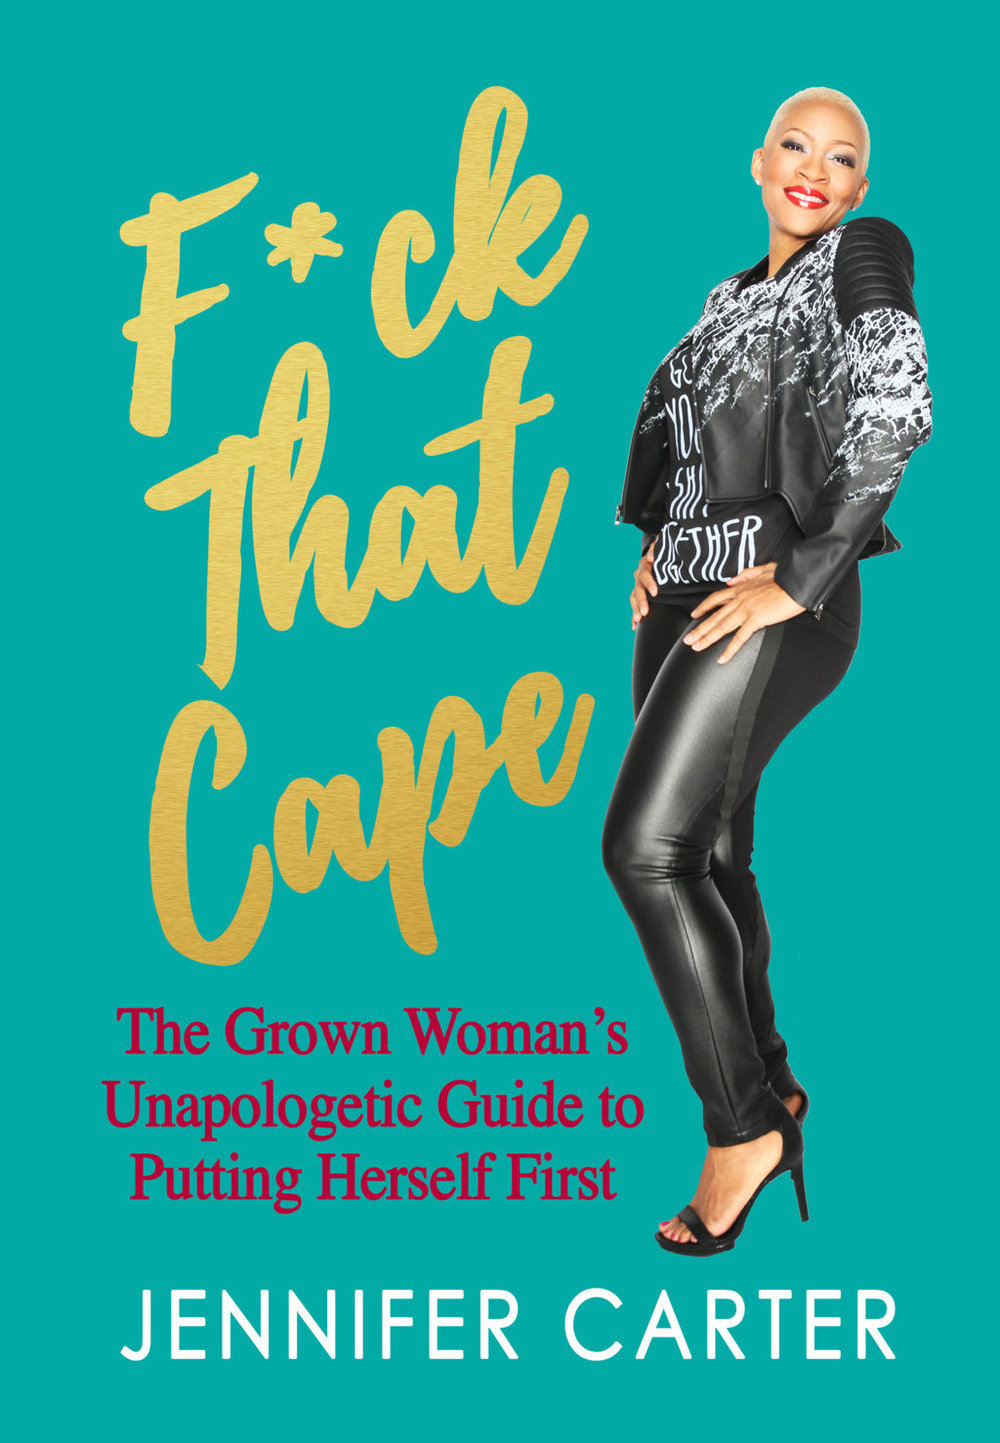 Fuck that cape book cover-mockup (FILEminimizer).jpg